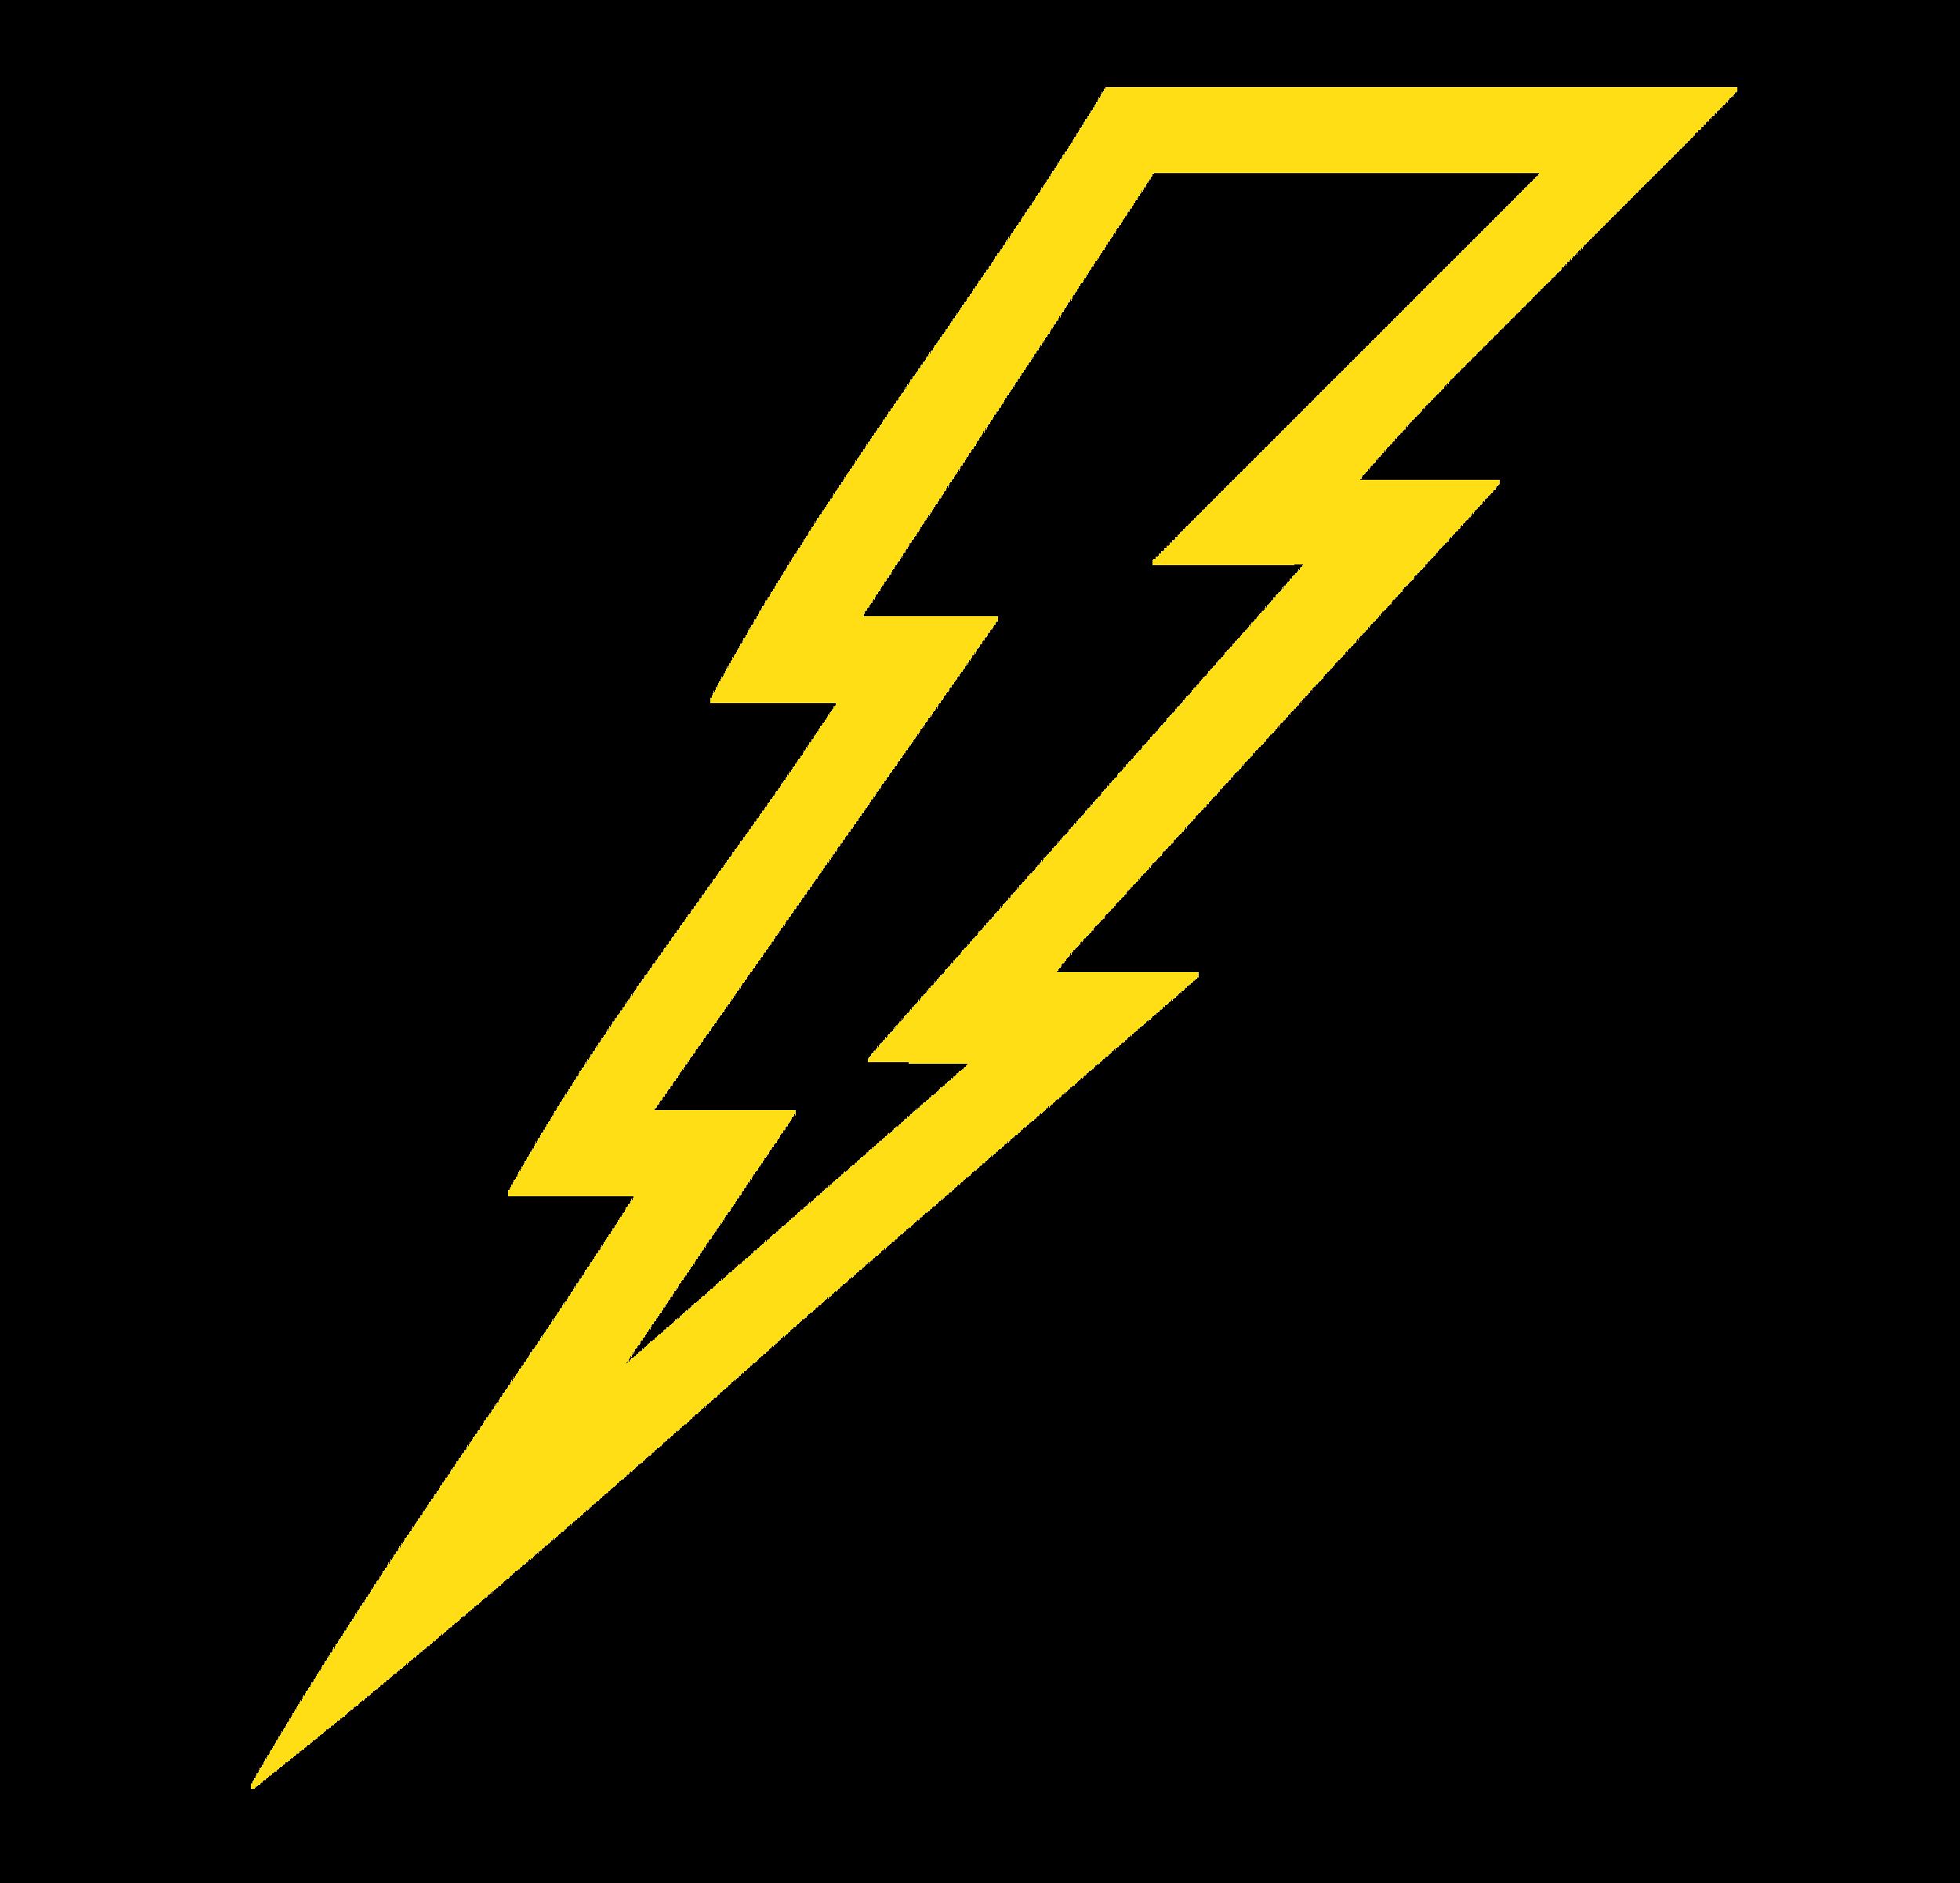 Lightning Bolt Bolt Clipart 7 Lighting B-Lightning bolt bolt clipart 7 lighting bolt french bathroom-9